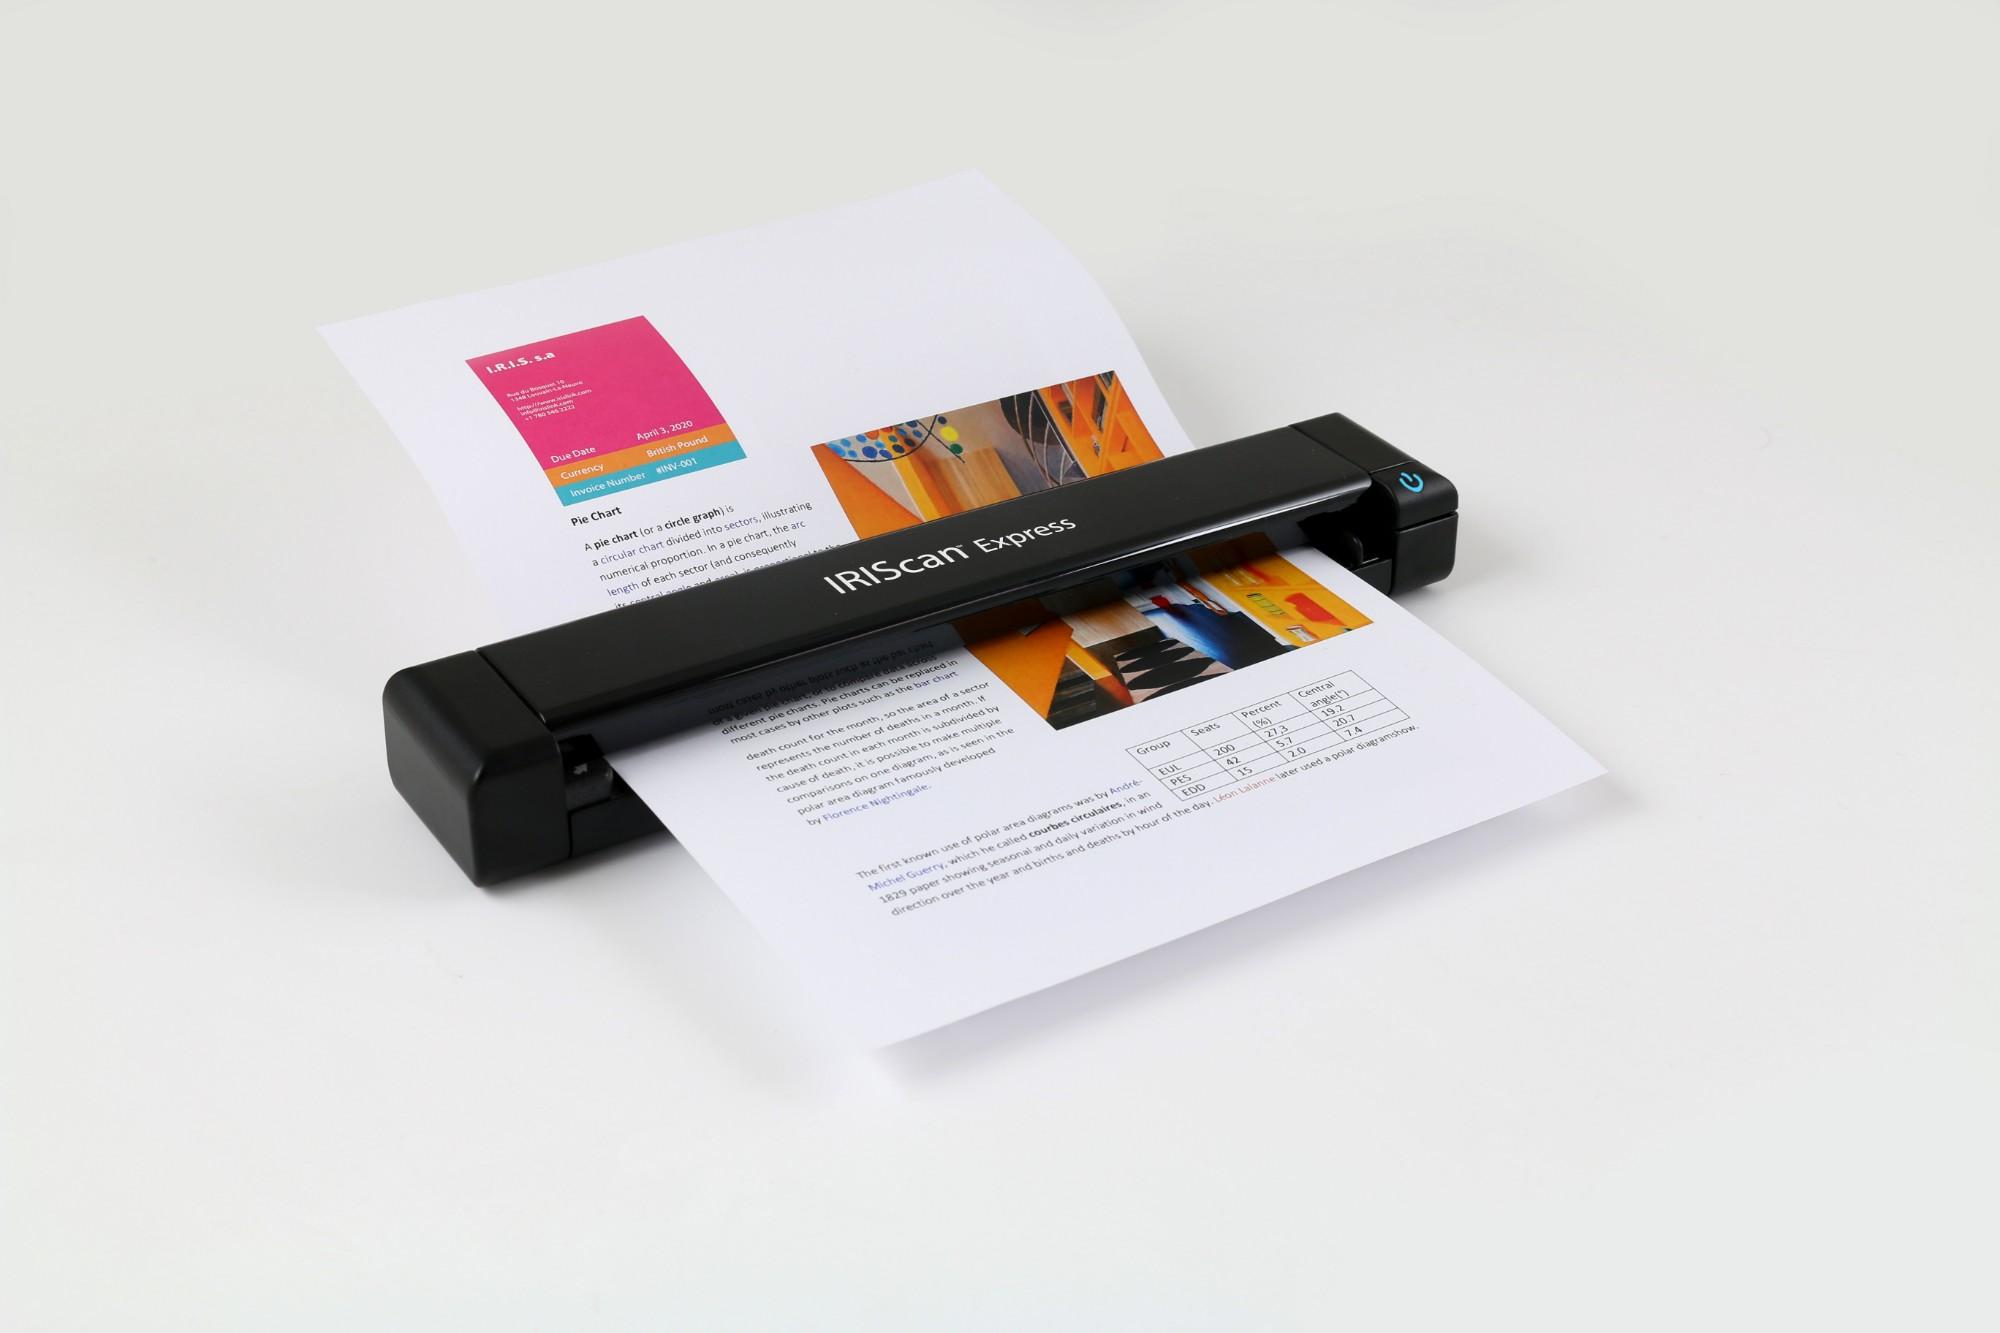 I.R.I.S. IRIScan Express 4 Sheet-fed scanner 1200 x 1200DPI A4 Black